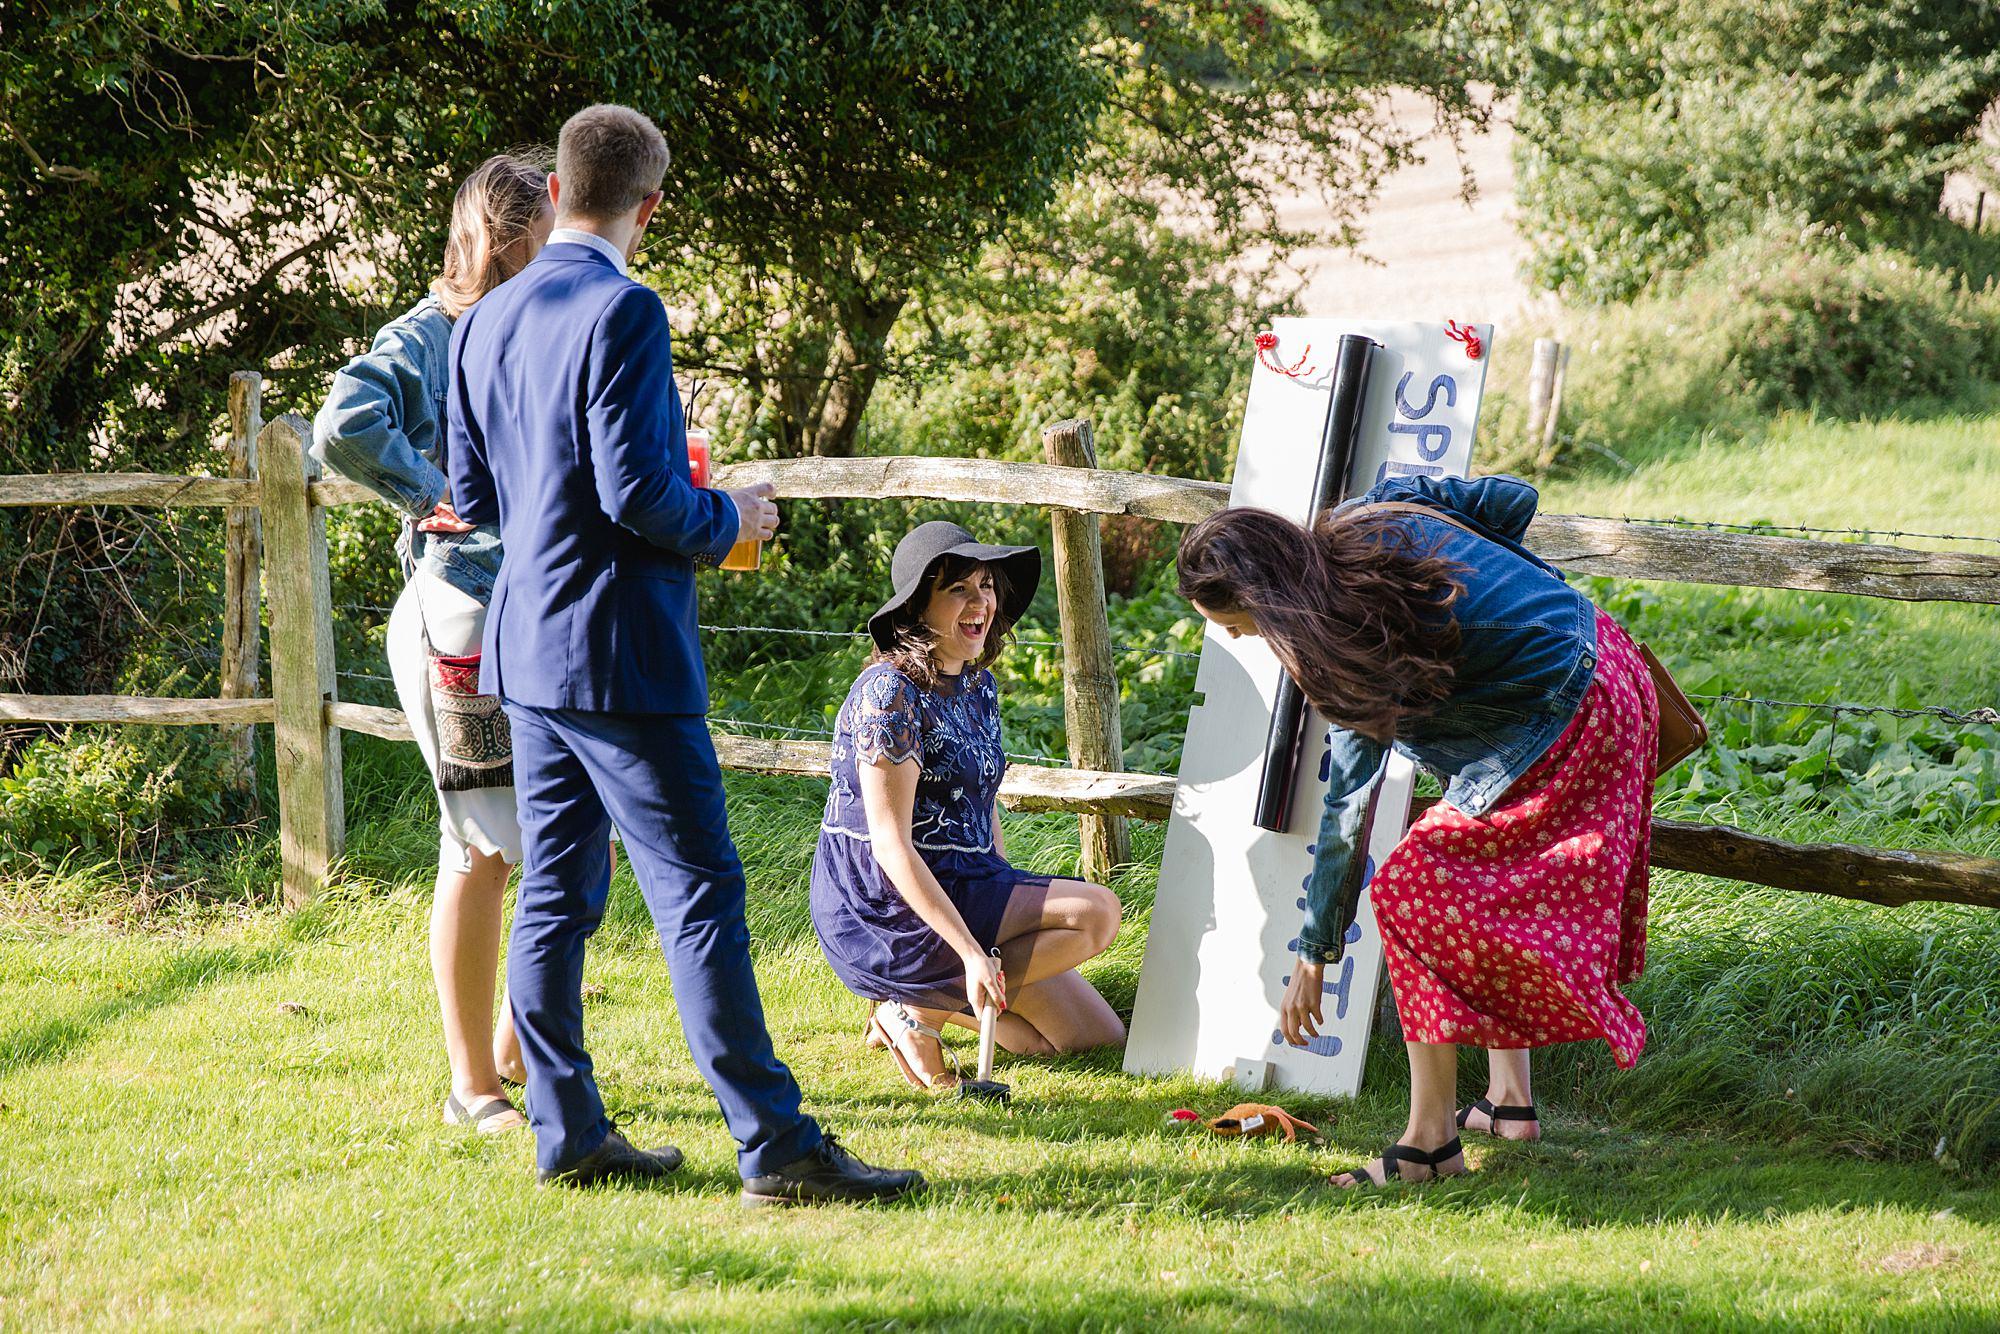 Fun village hall wedding guests play splat the rat